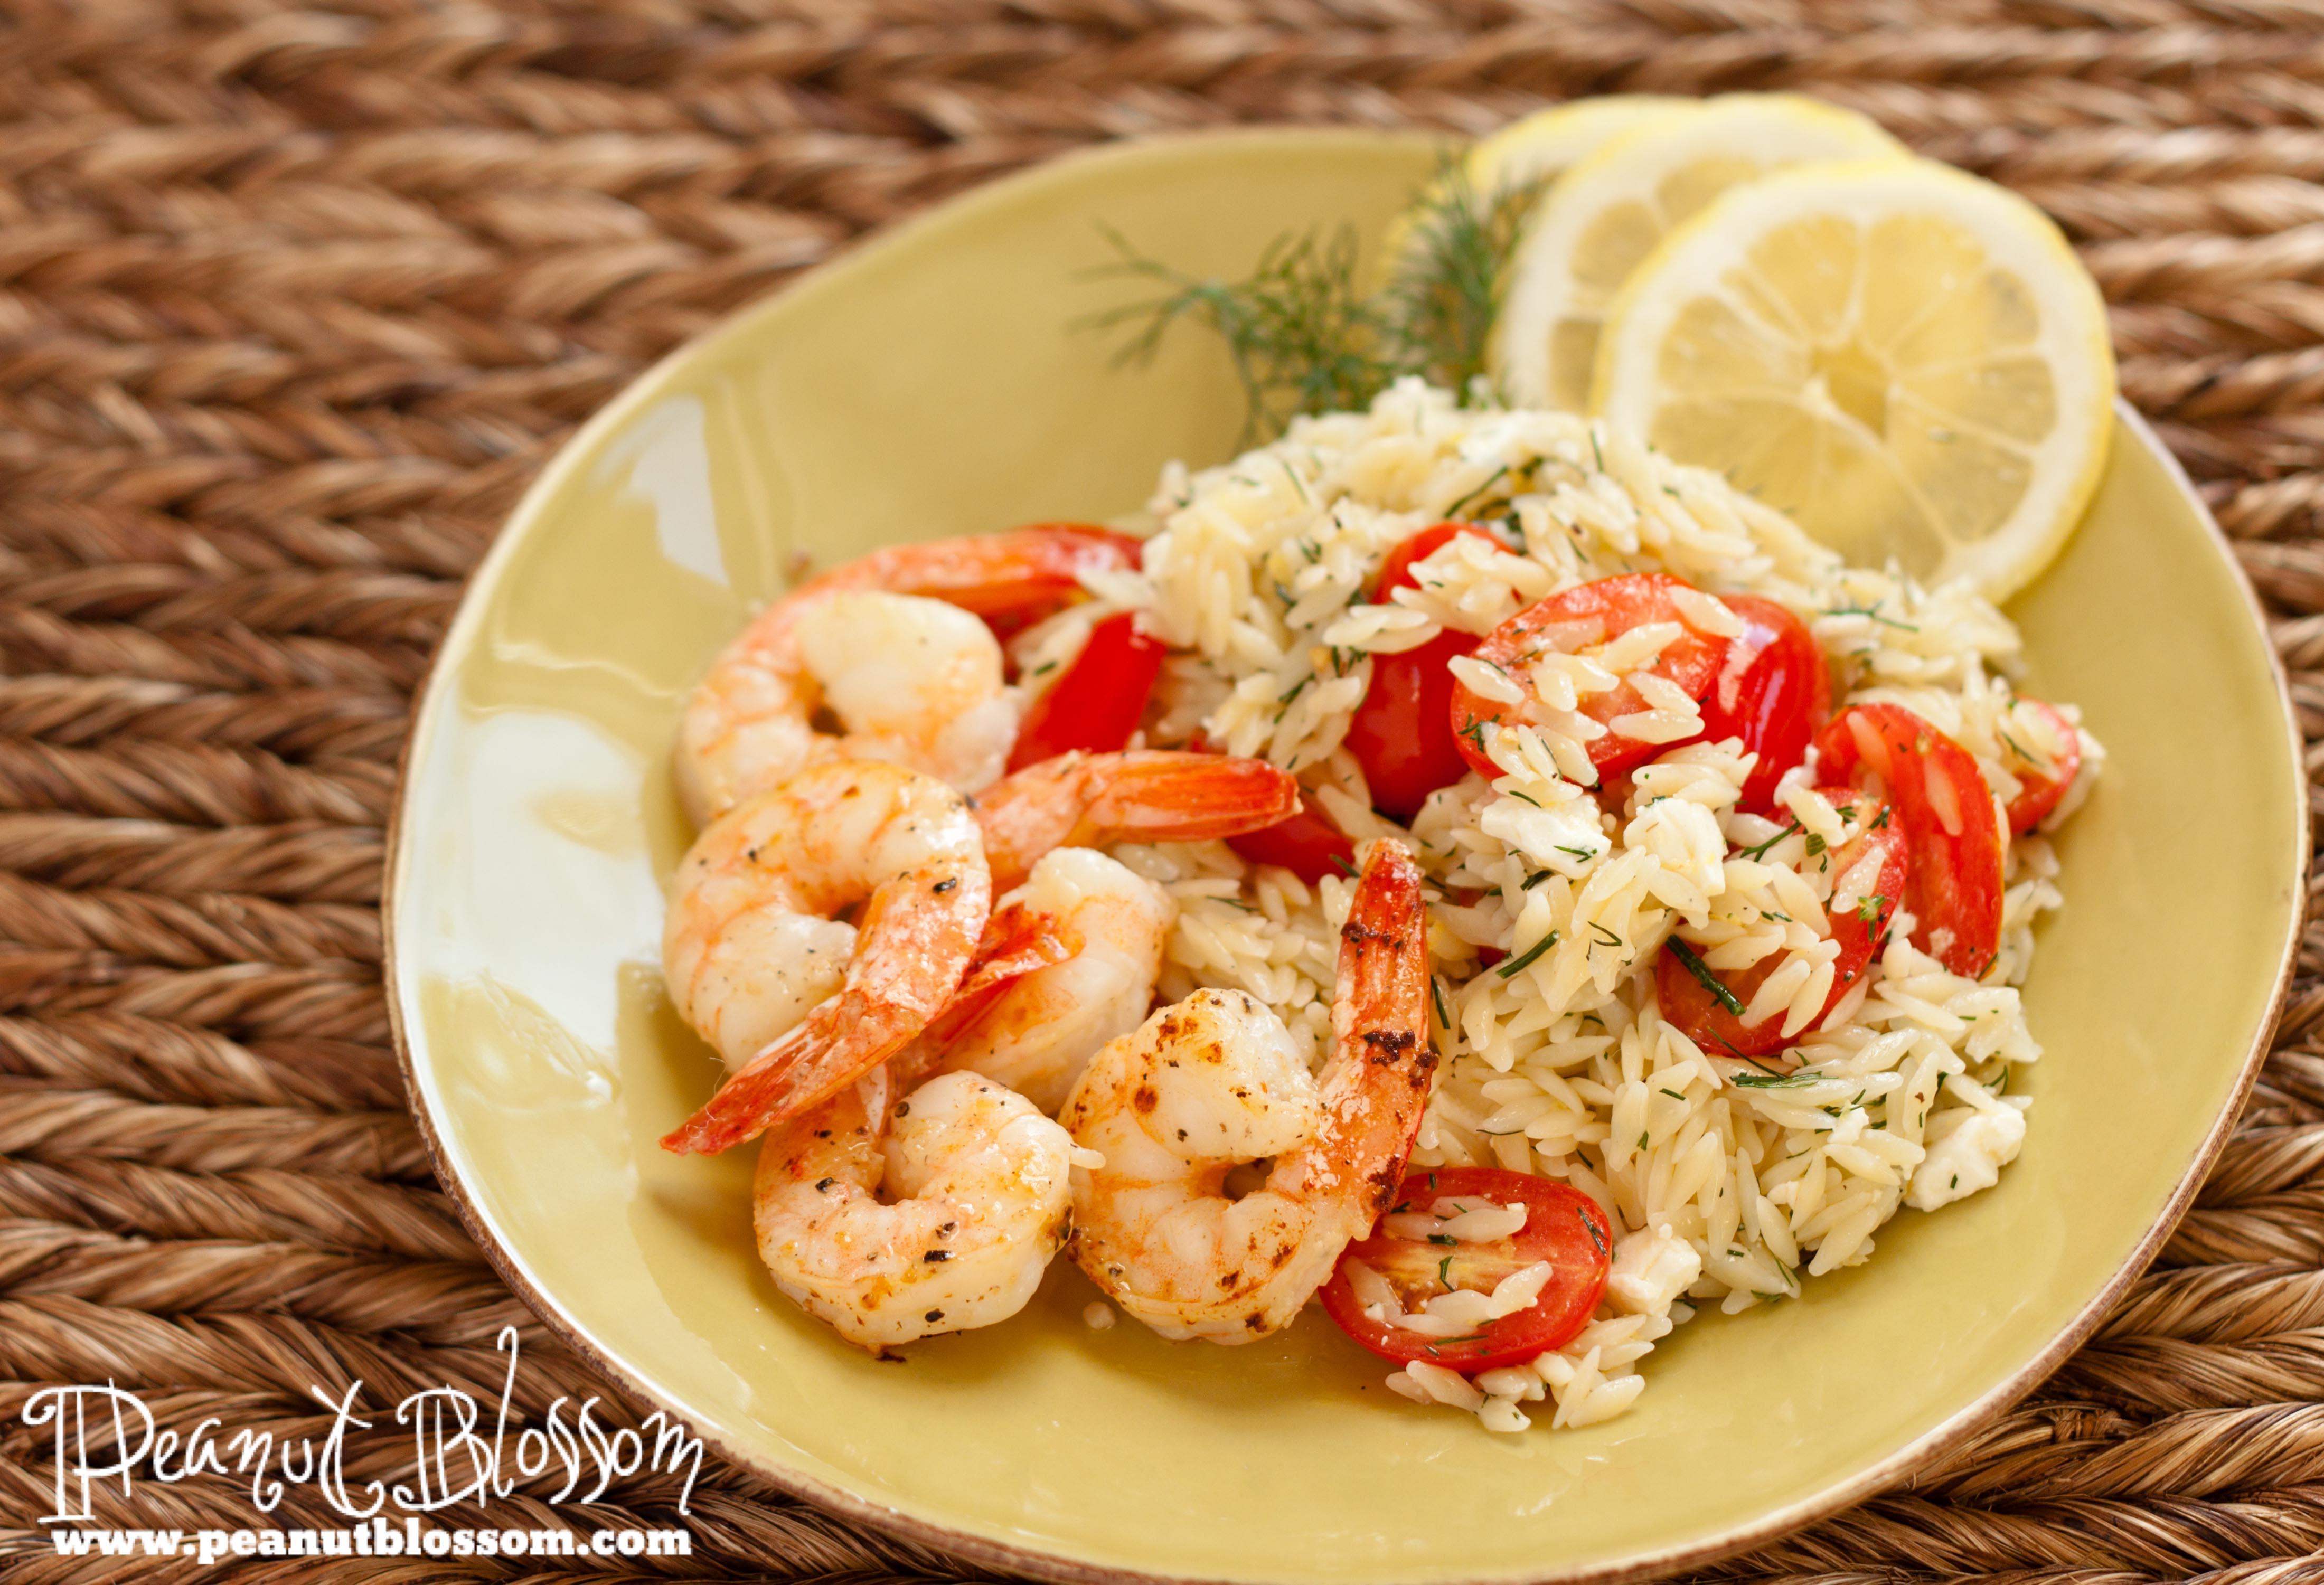 Shrimp with lemony orzo & tomato salad